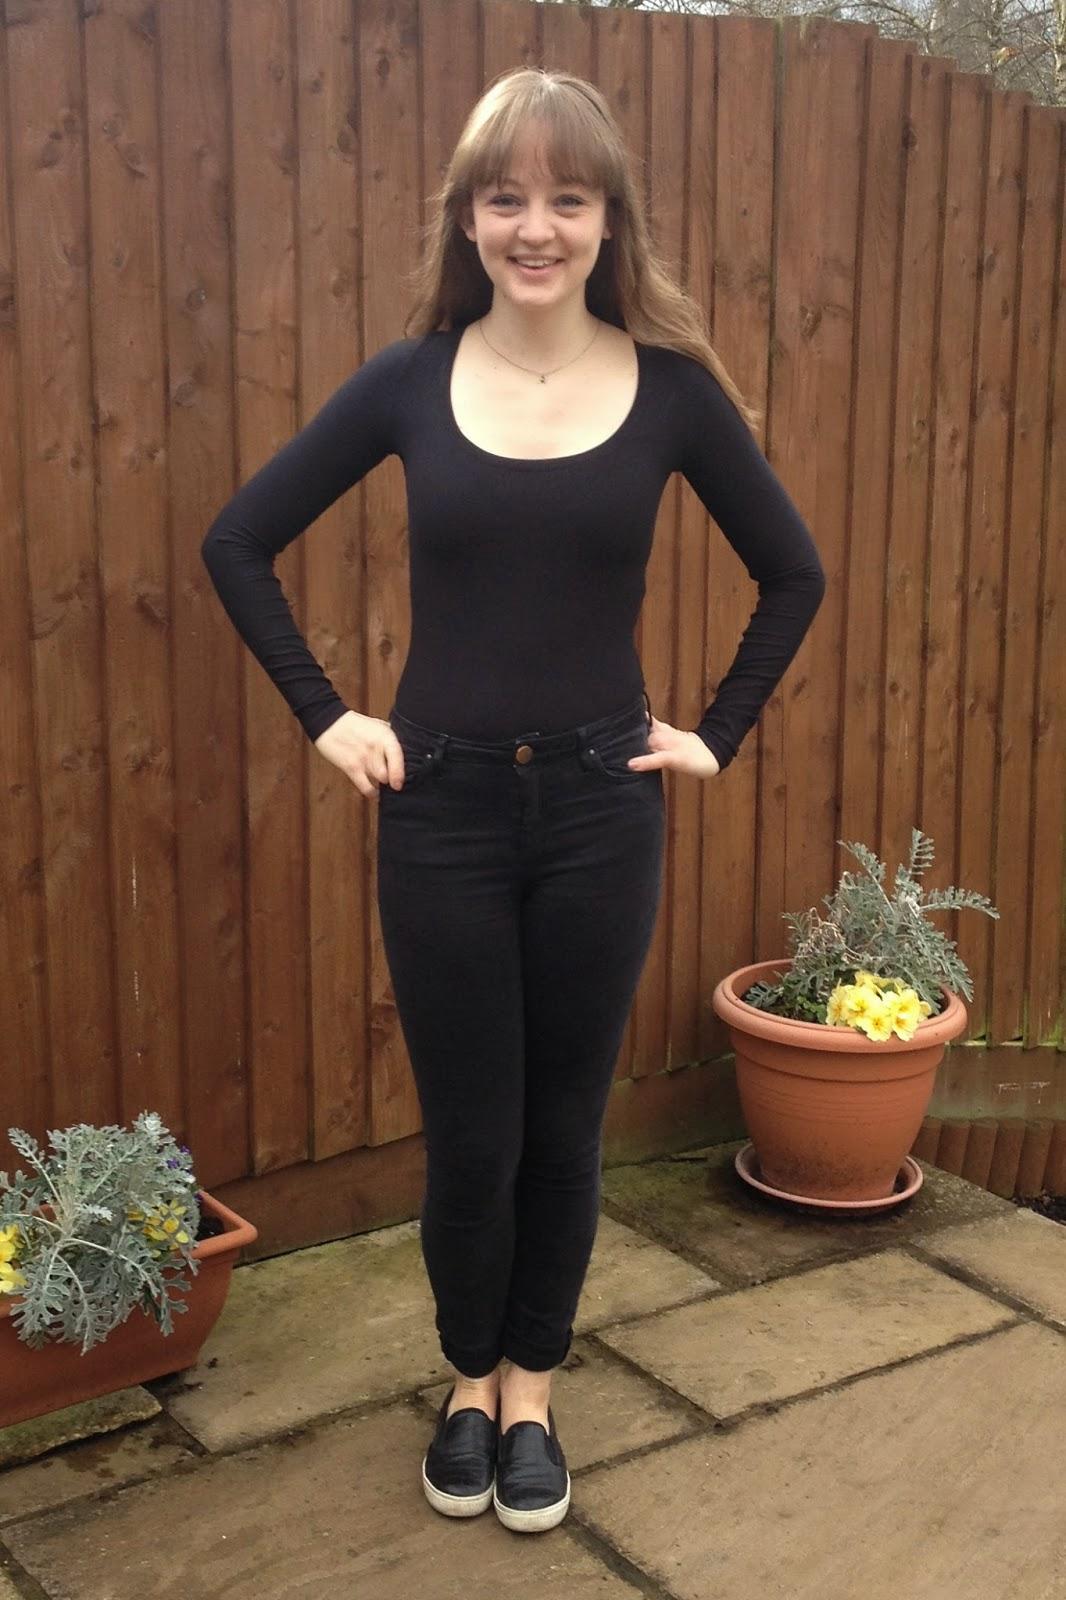 Diary of a Chain Stitcher: Bamboo Jersey Nettie Bodysuit